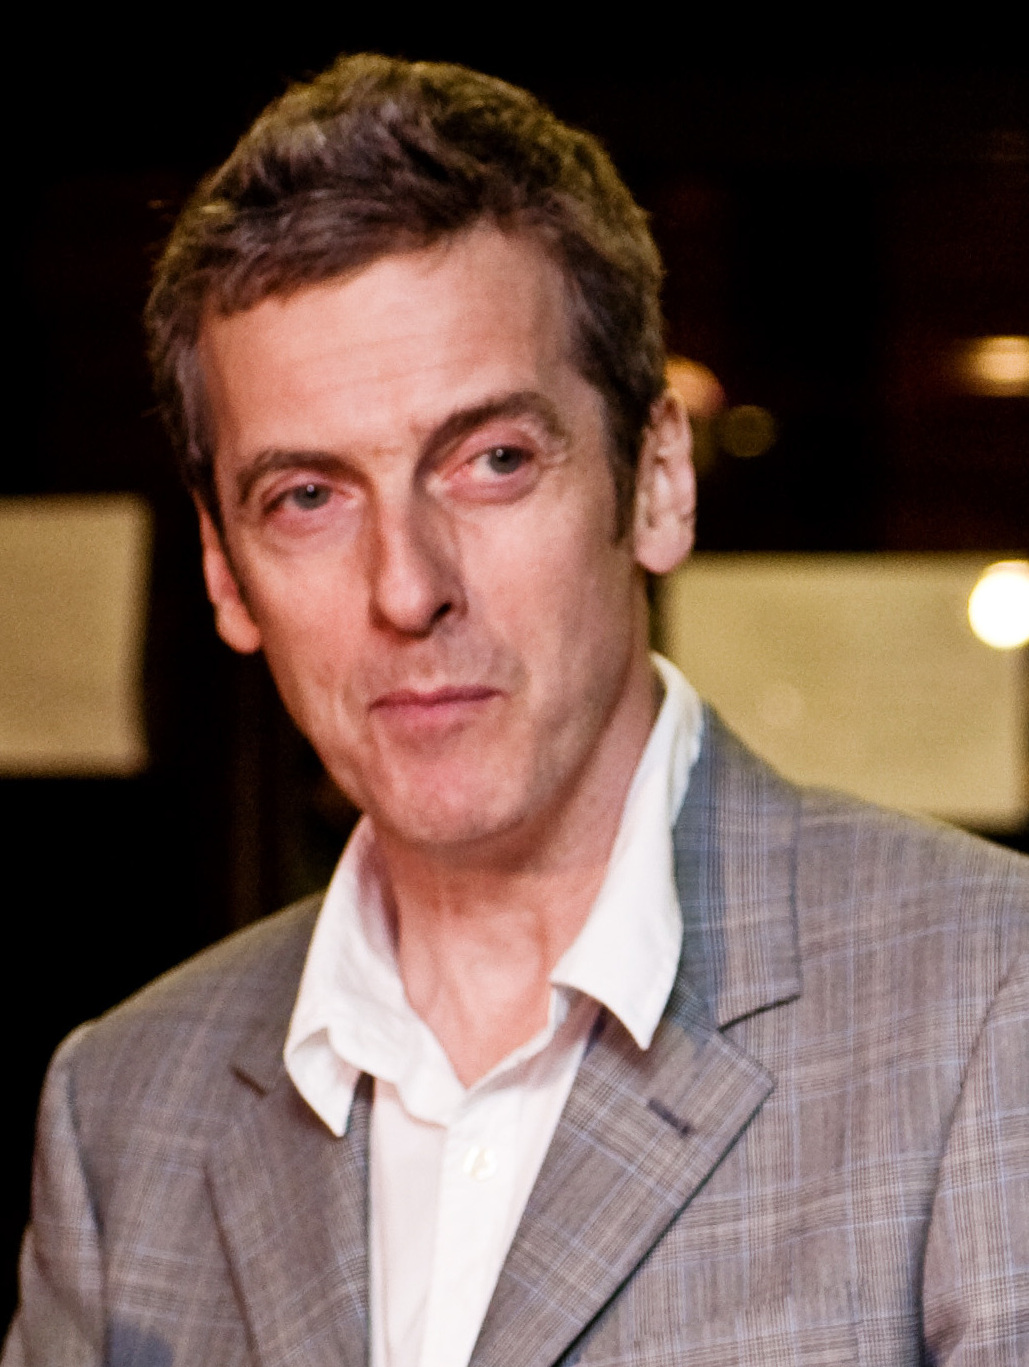 Peter Capaldi (born 1958)